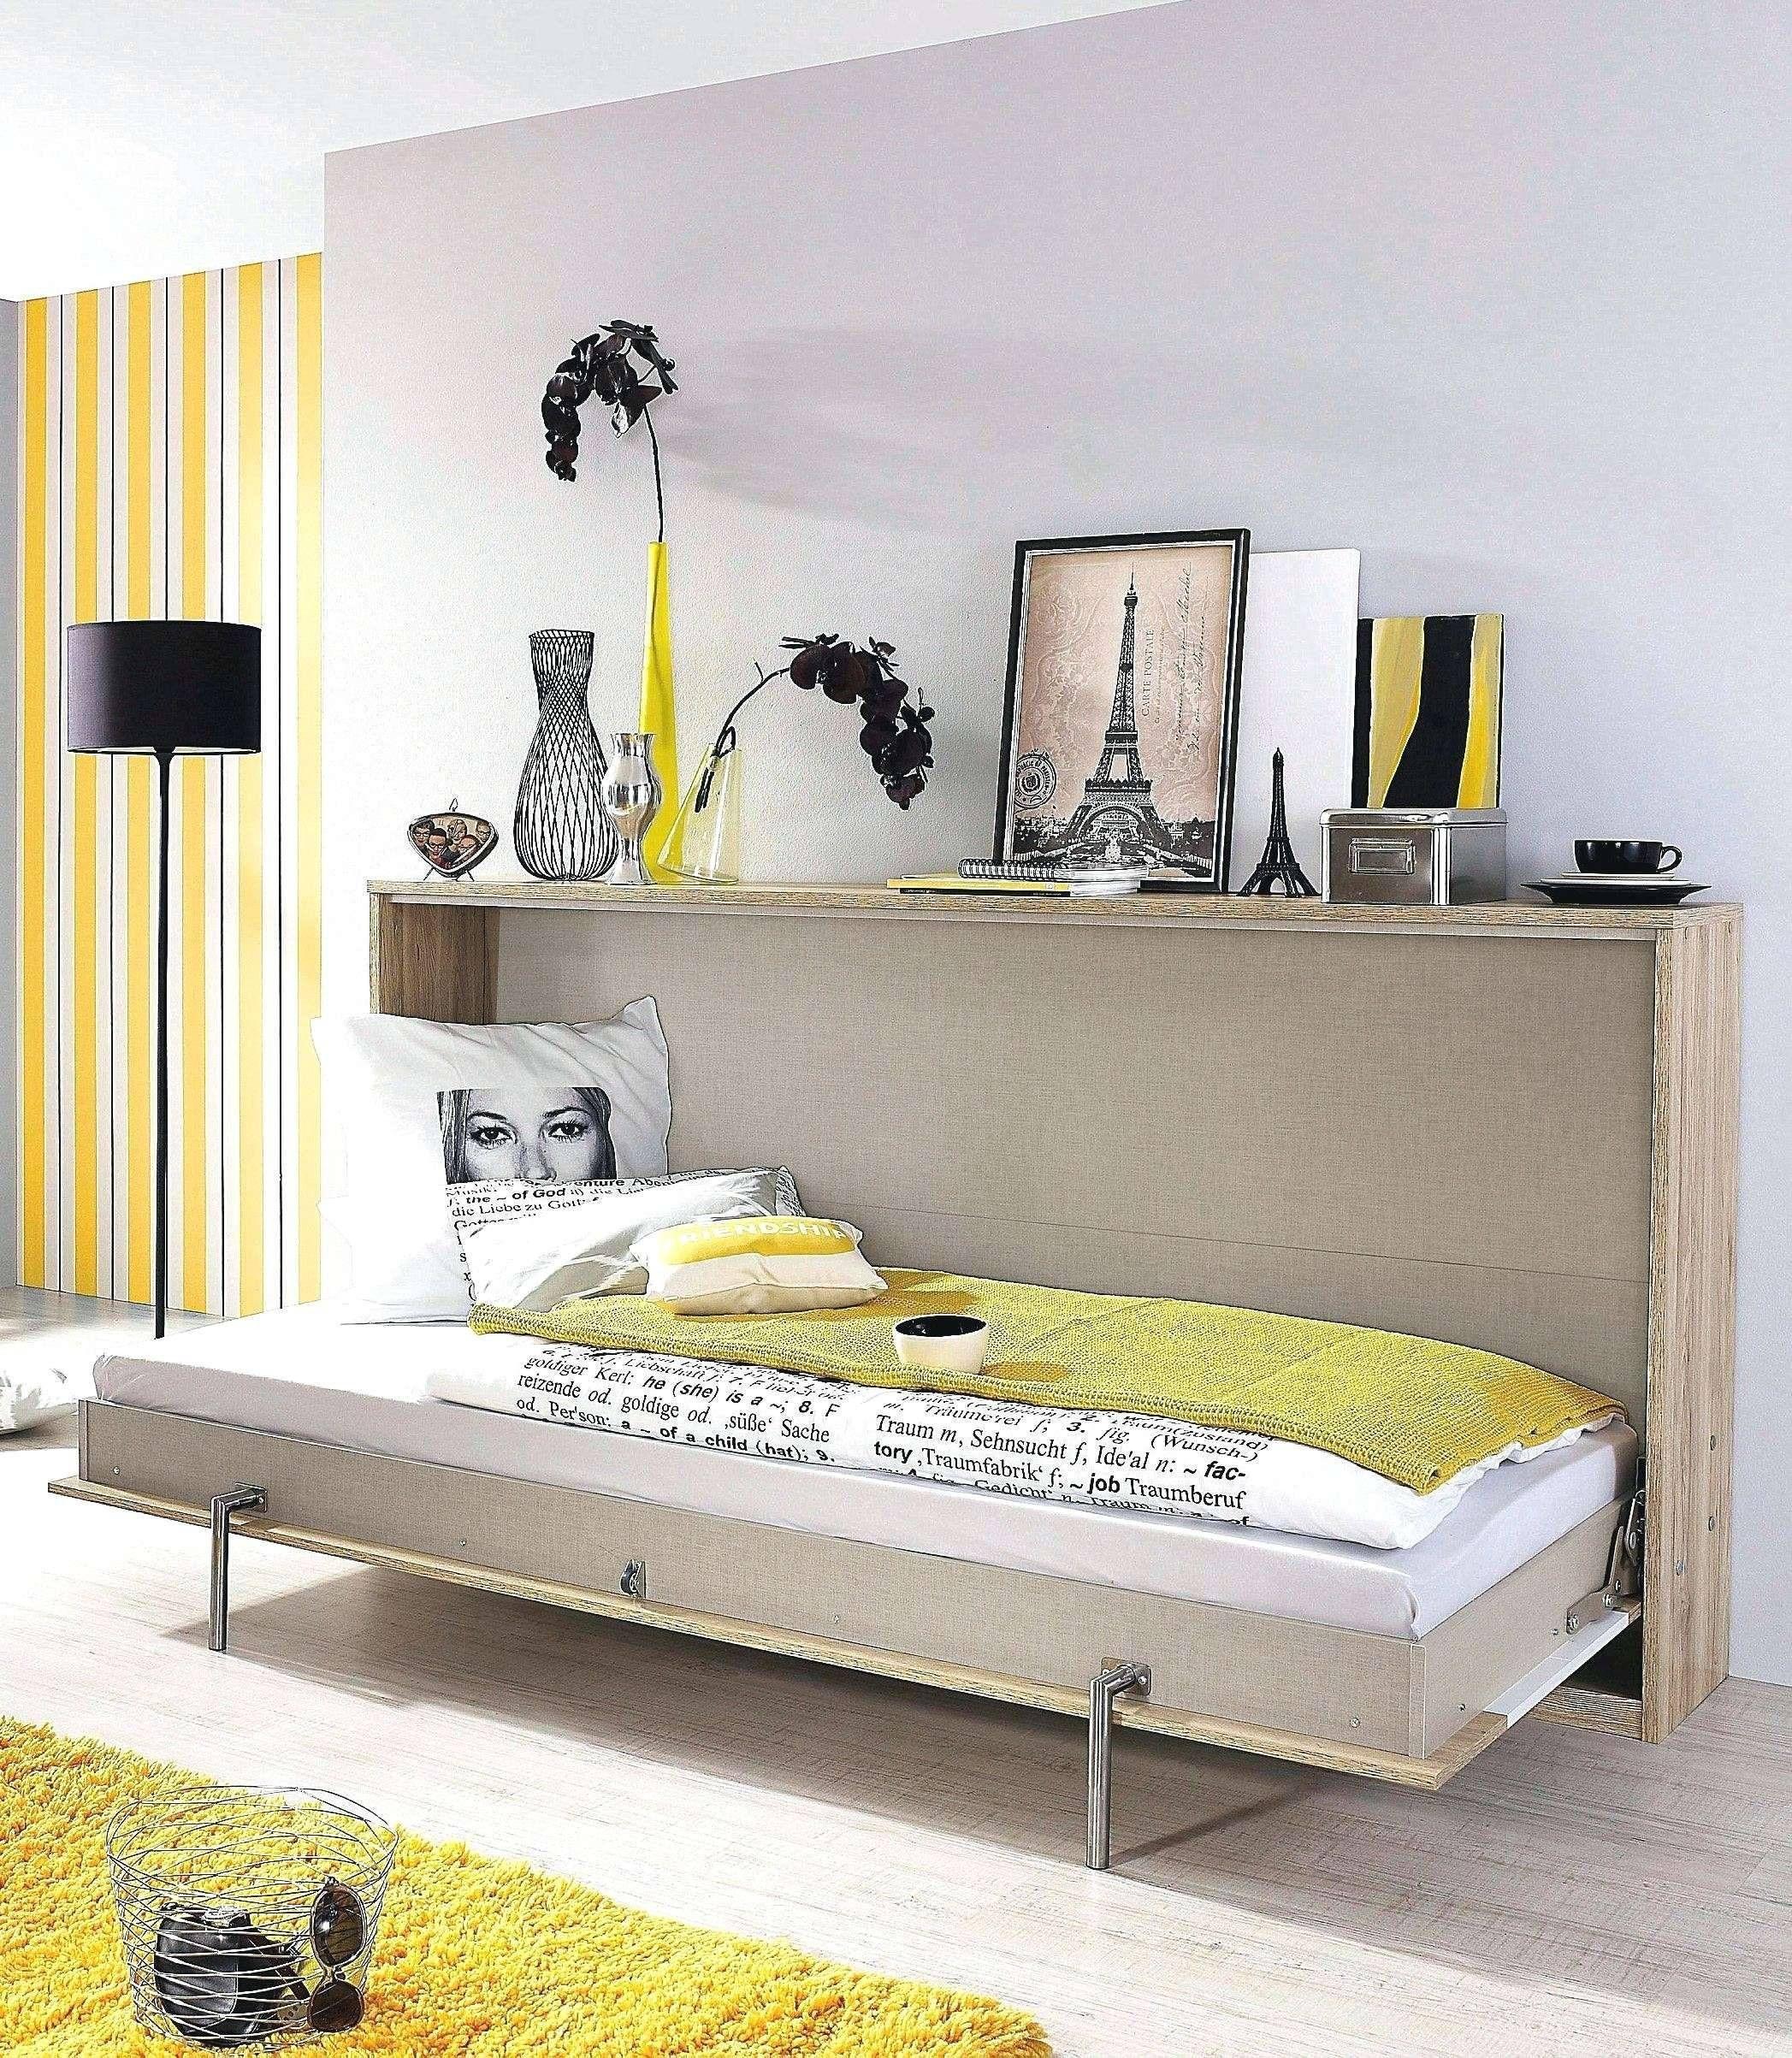 bois de lit 160x200 cadre de lit blanc ikea cadre de lit trysil jugendbett 160x200